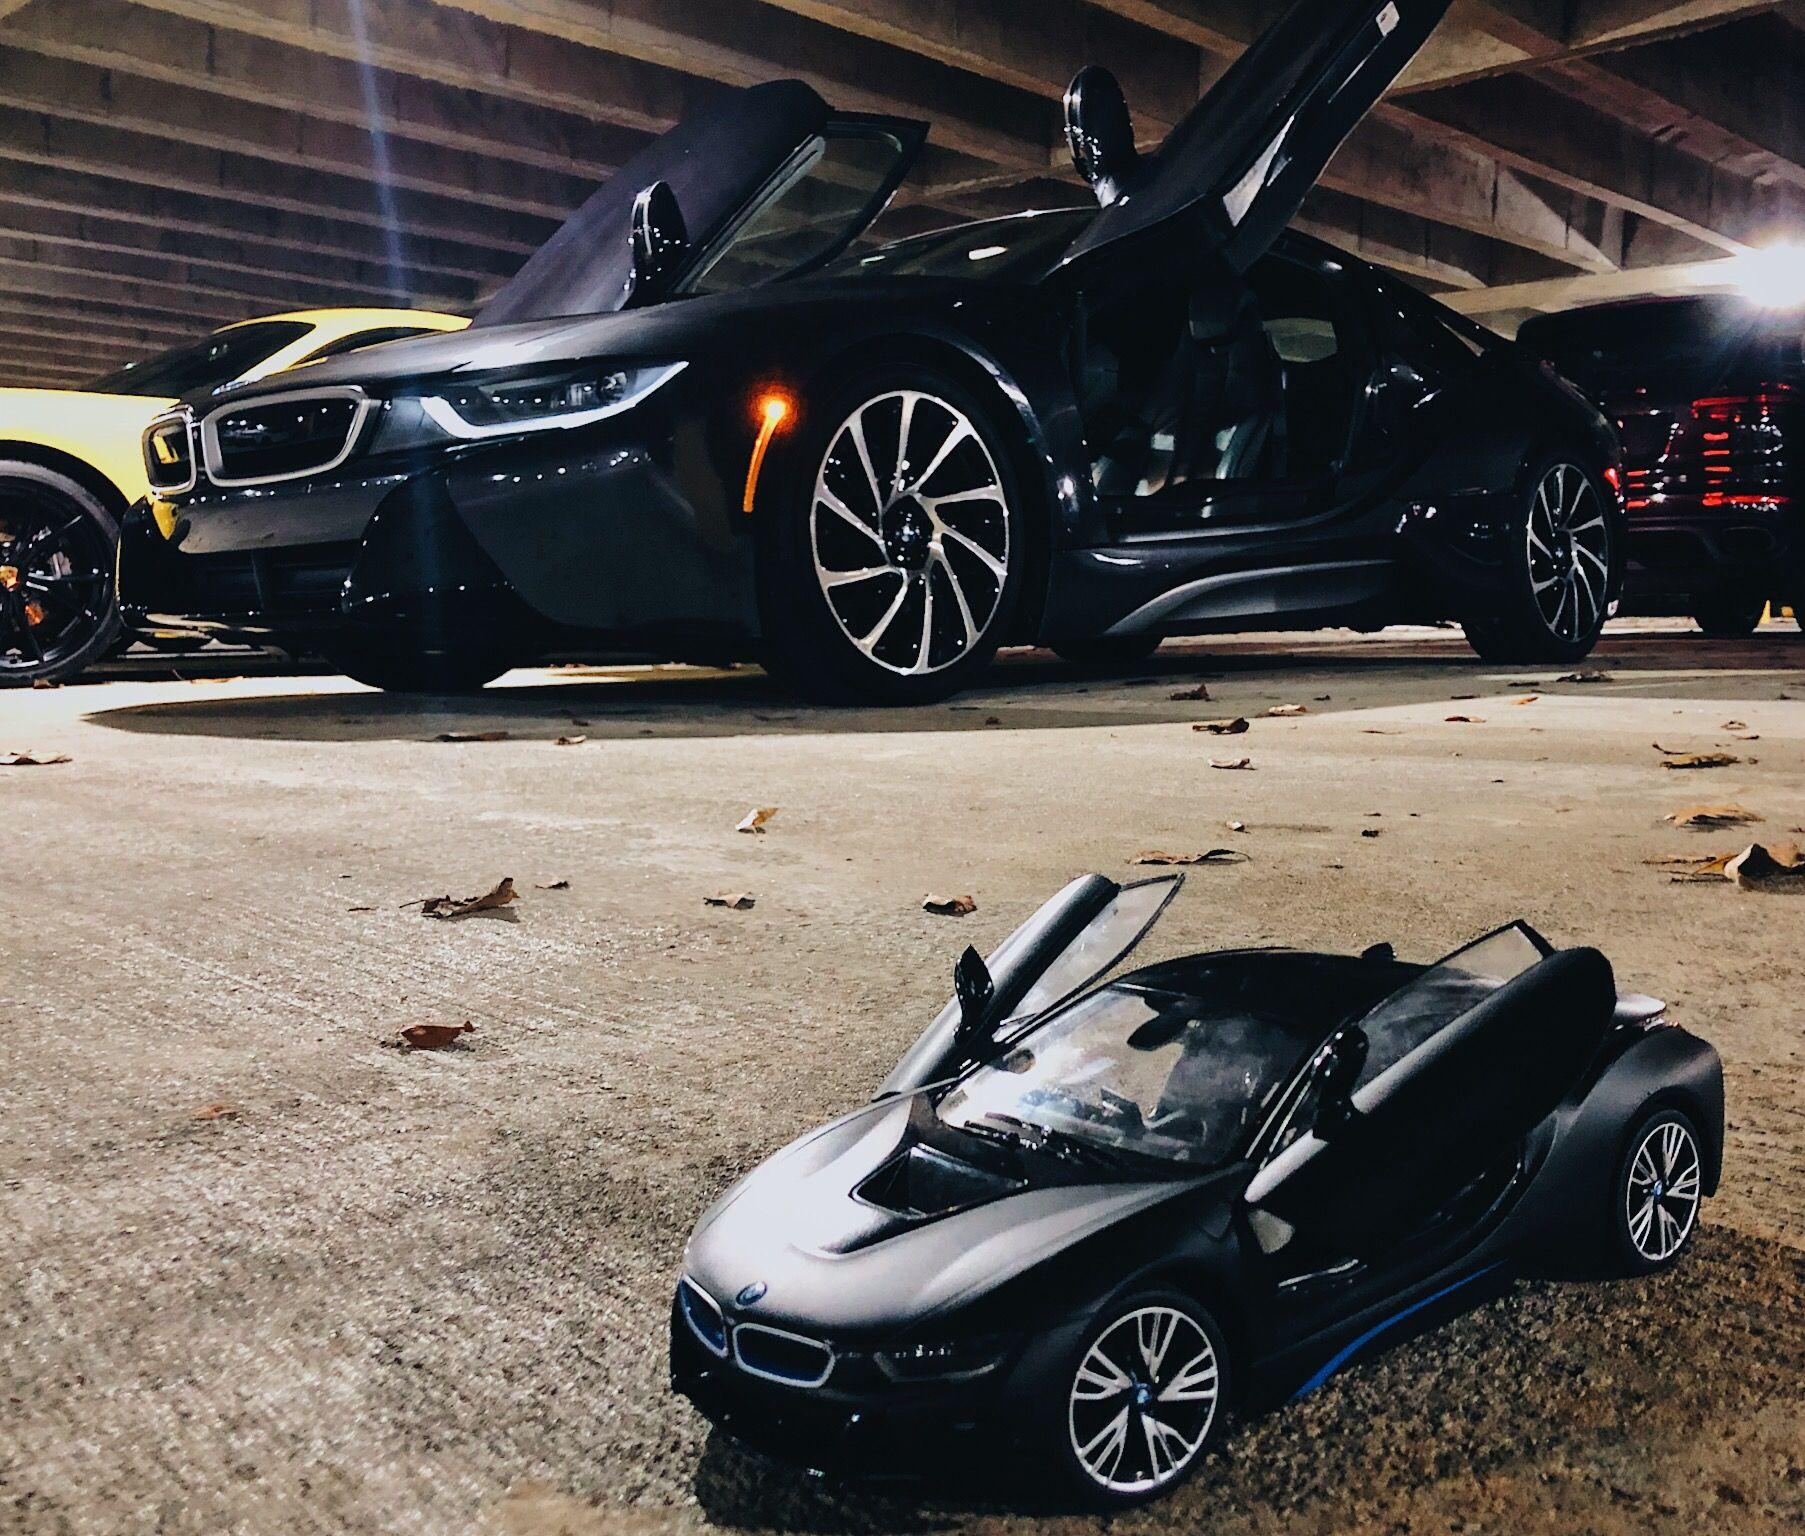 Like father like son BMW Bmw, Bmw i8, Vehicles